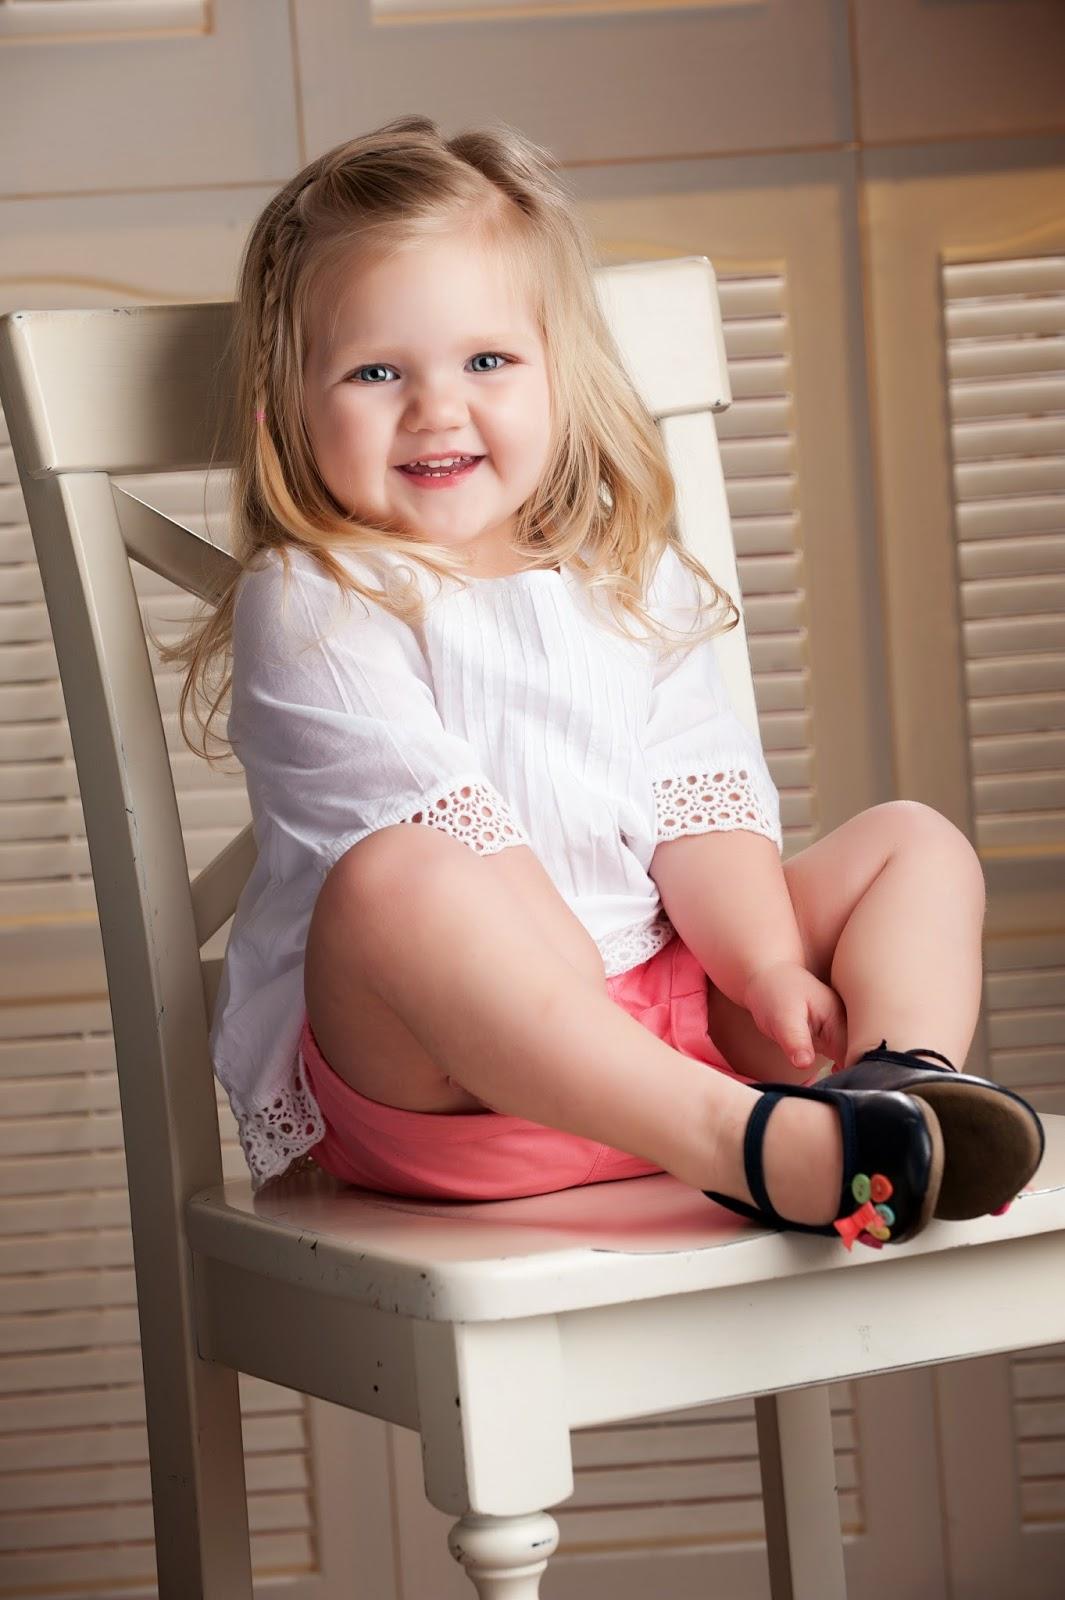 baer photography: 2016 cute kid contest